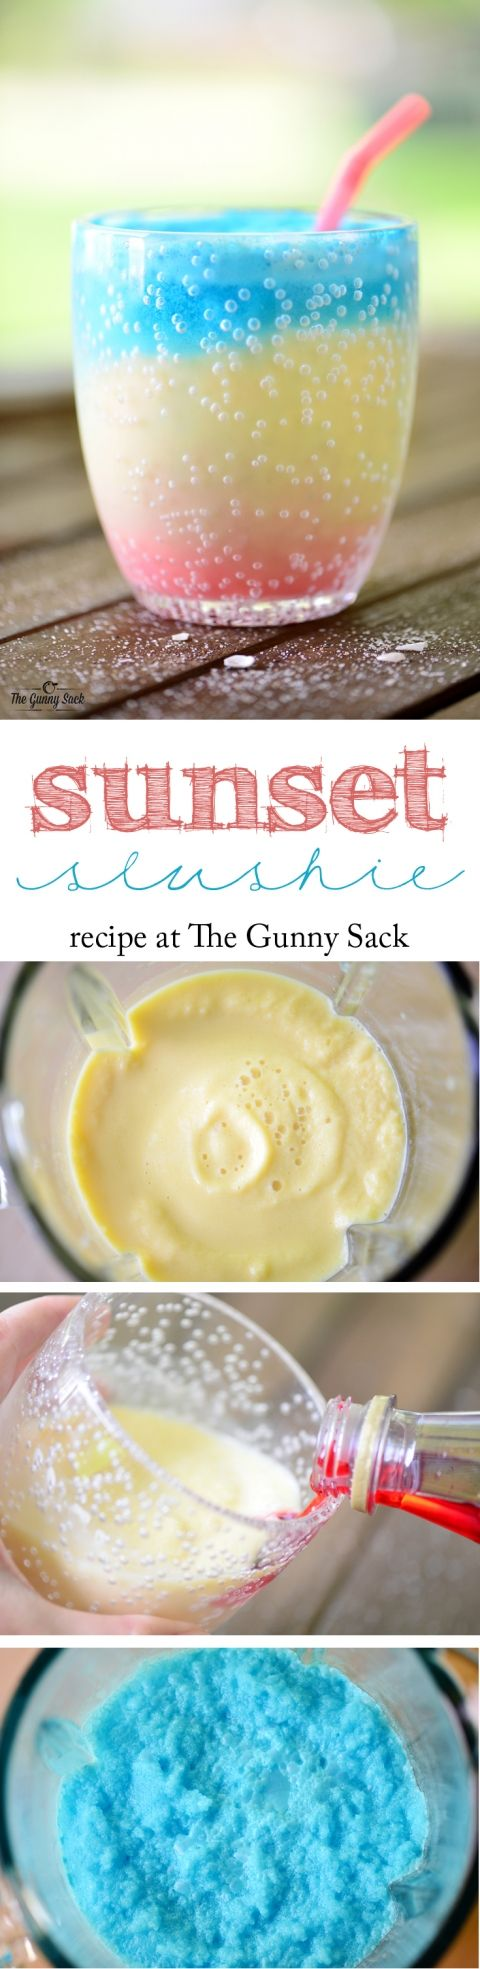 Best 25 slushy alcohol drinks ideas on pinterest for Fun alcoholic drinks to make